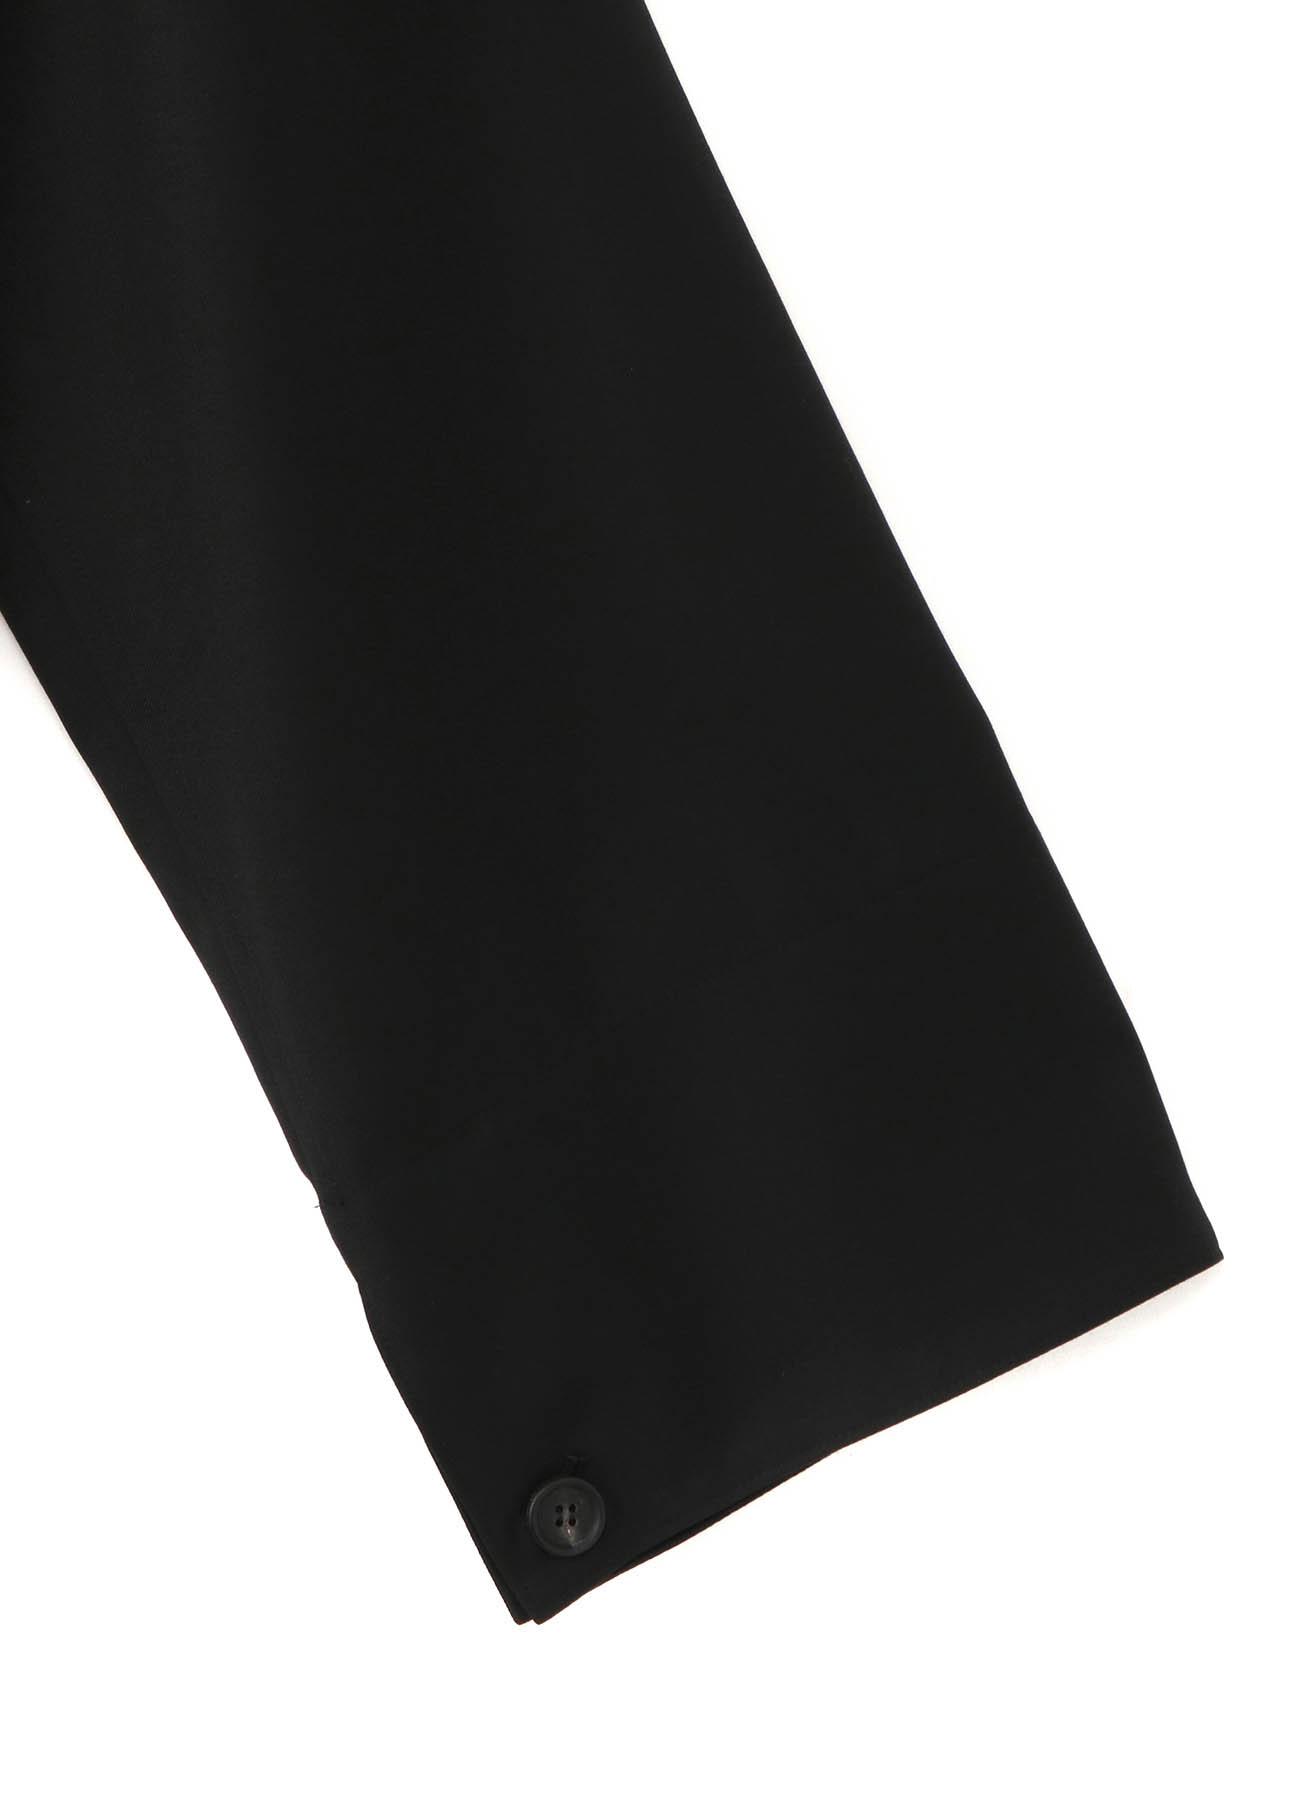 T/W Gabardine Tailored Wrap Dress Coat